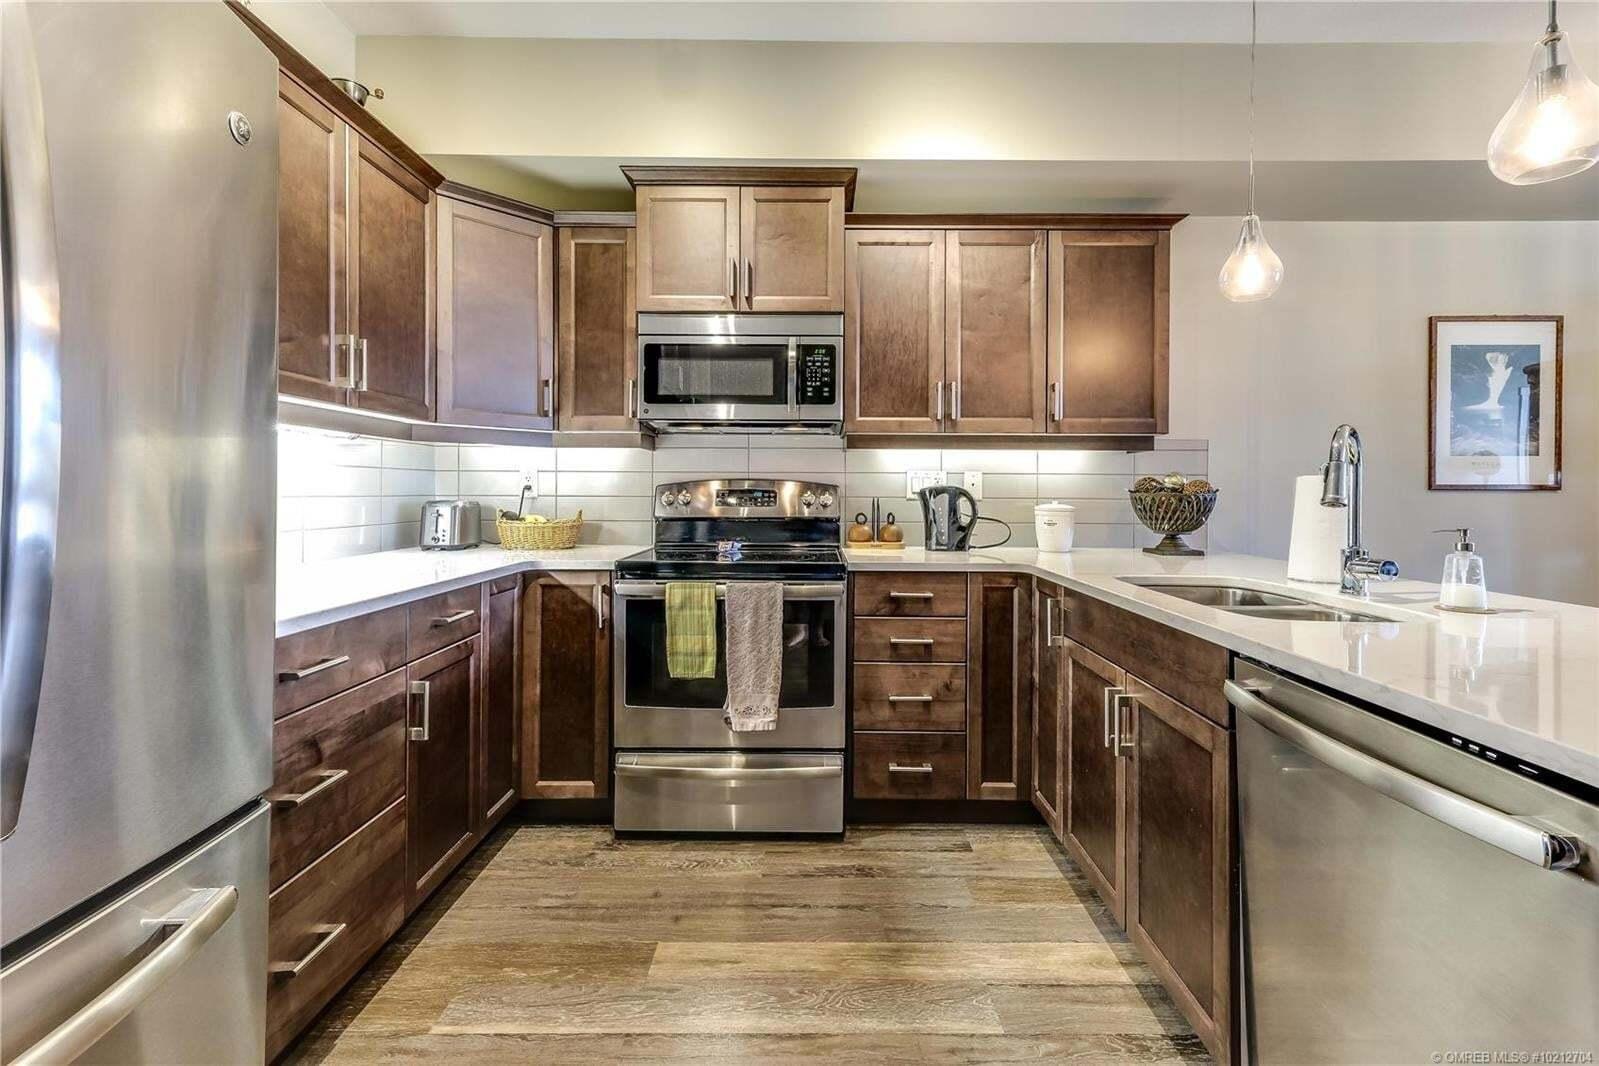 Condo for sale at 3731 Casorso Rd Kelowna British Columbia - MLS: 10212704